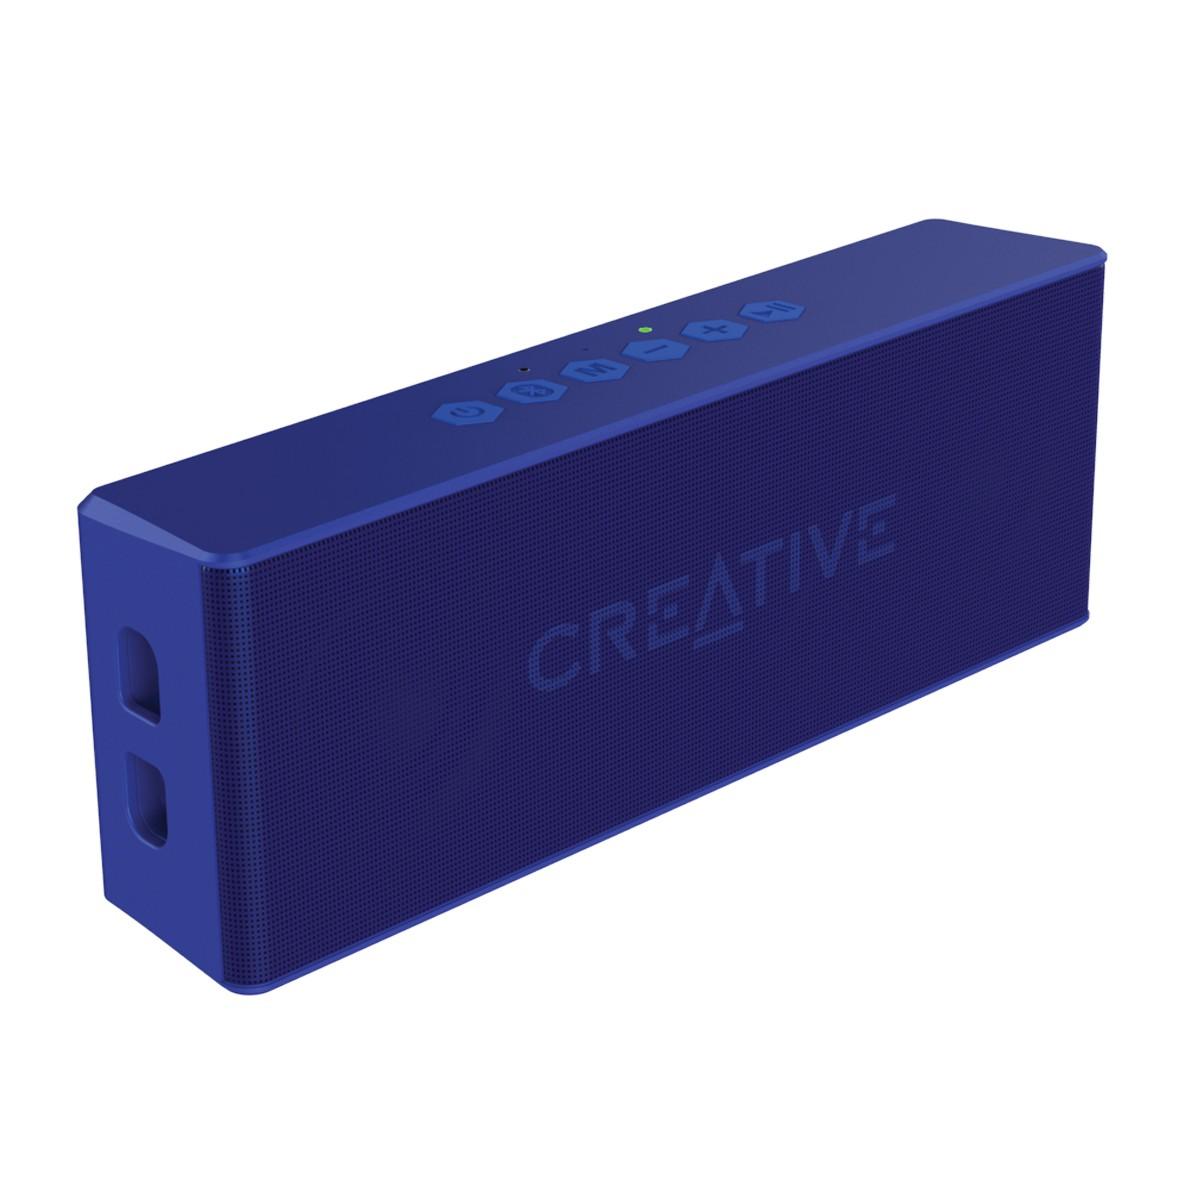 CREATIVE repro MUVO 2 BLUE (bluetooth modré)